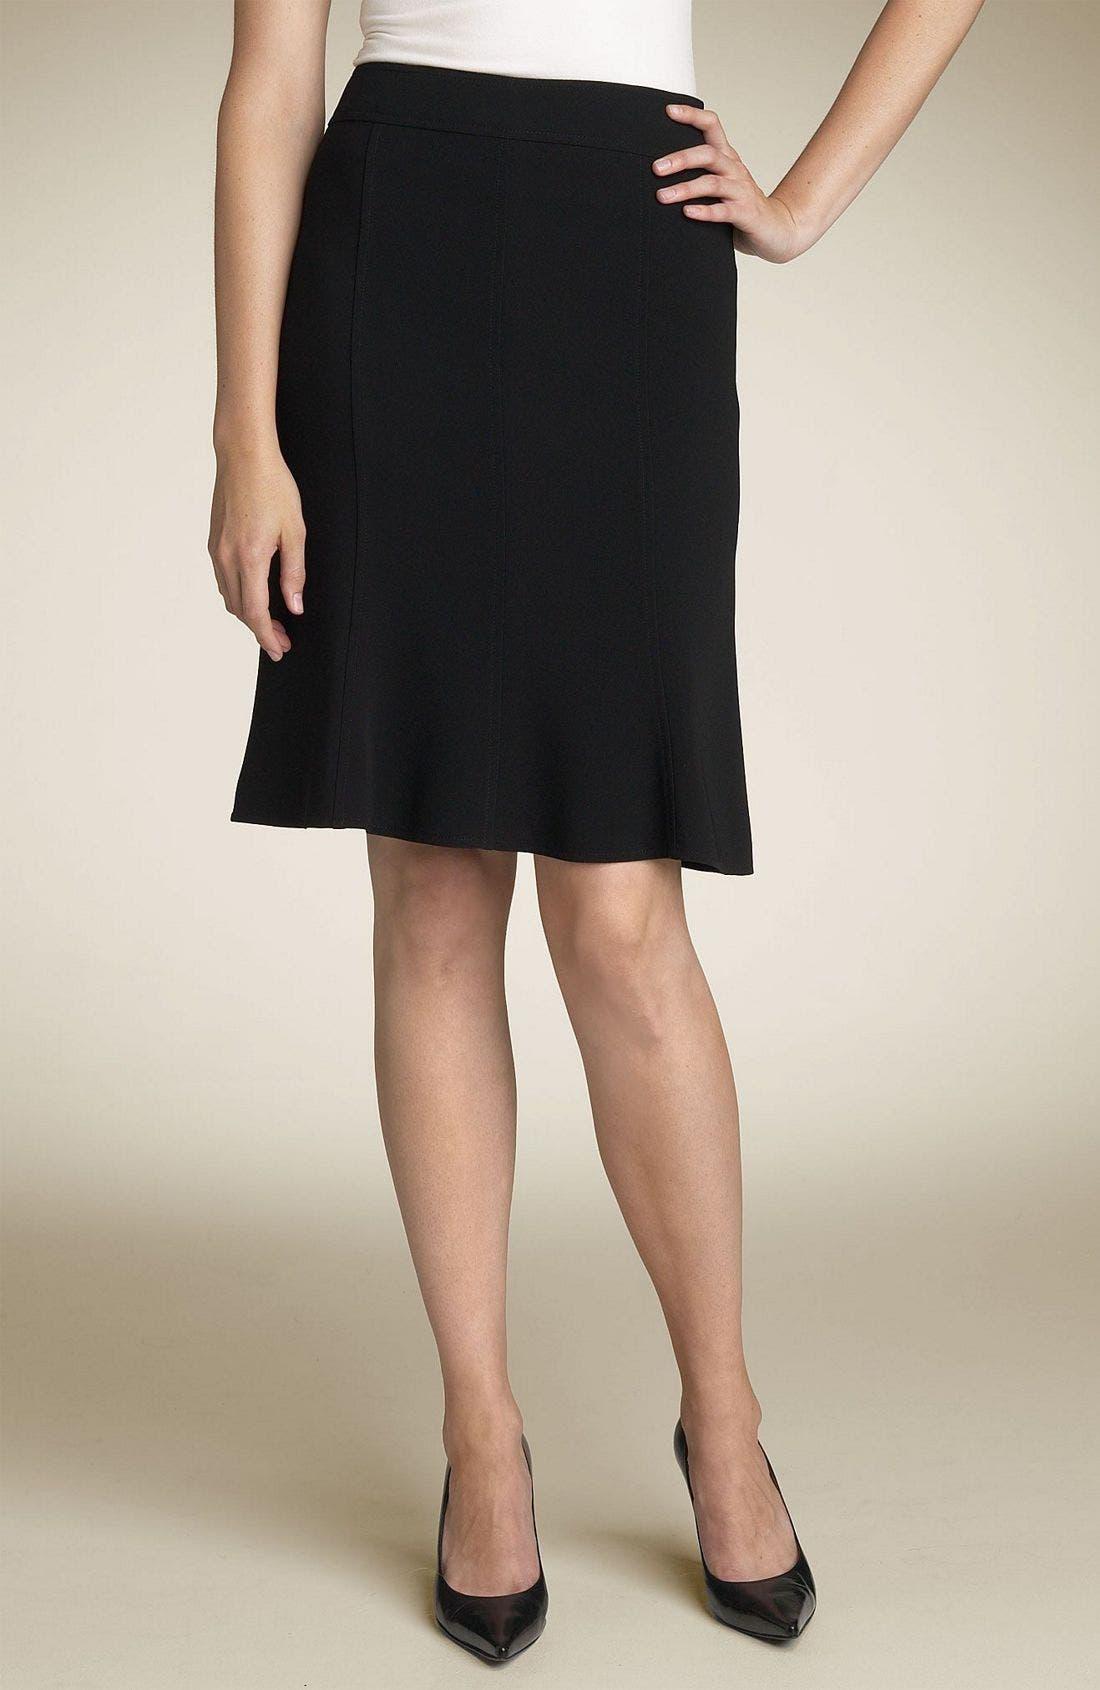 Alternate Image 1 Selected - Louben Panel Skirt (Petite)